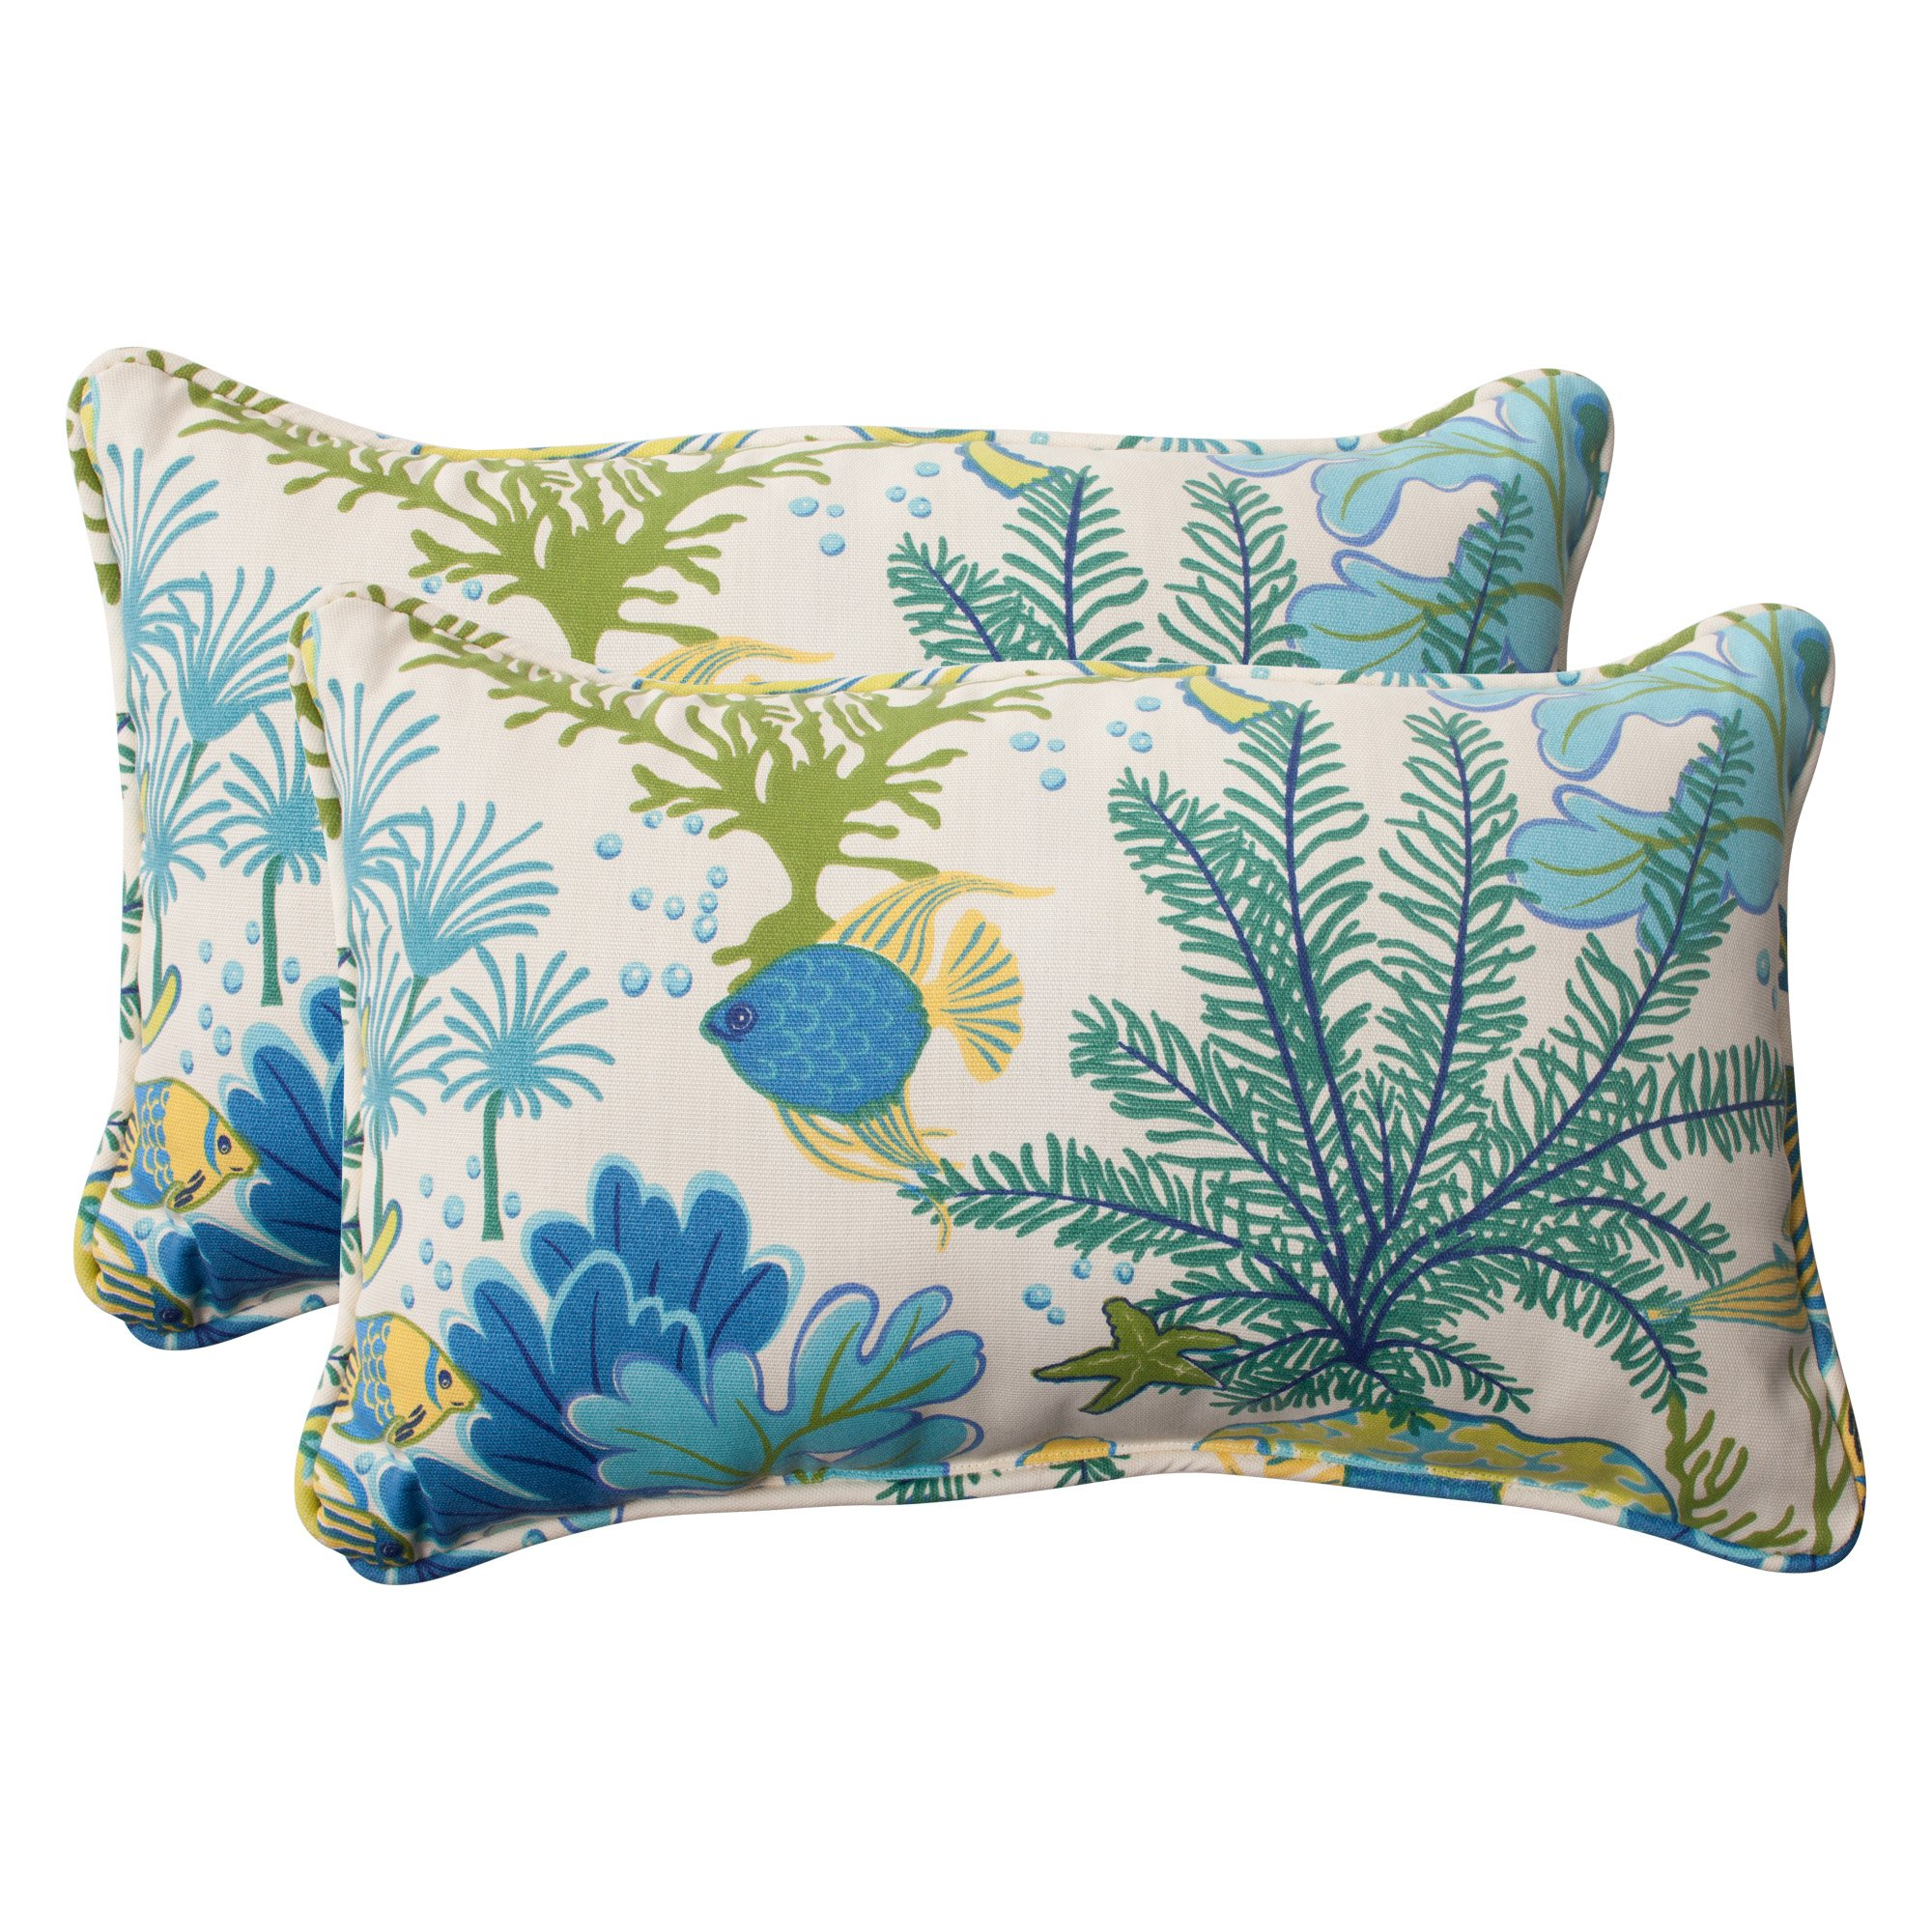 Pillow Perfect Indoor/Outdoor Splish Splash Corded Rectangular Throw Pillow, Blue, Set of 2